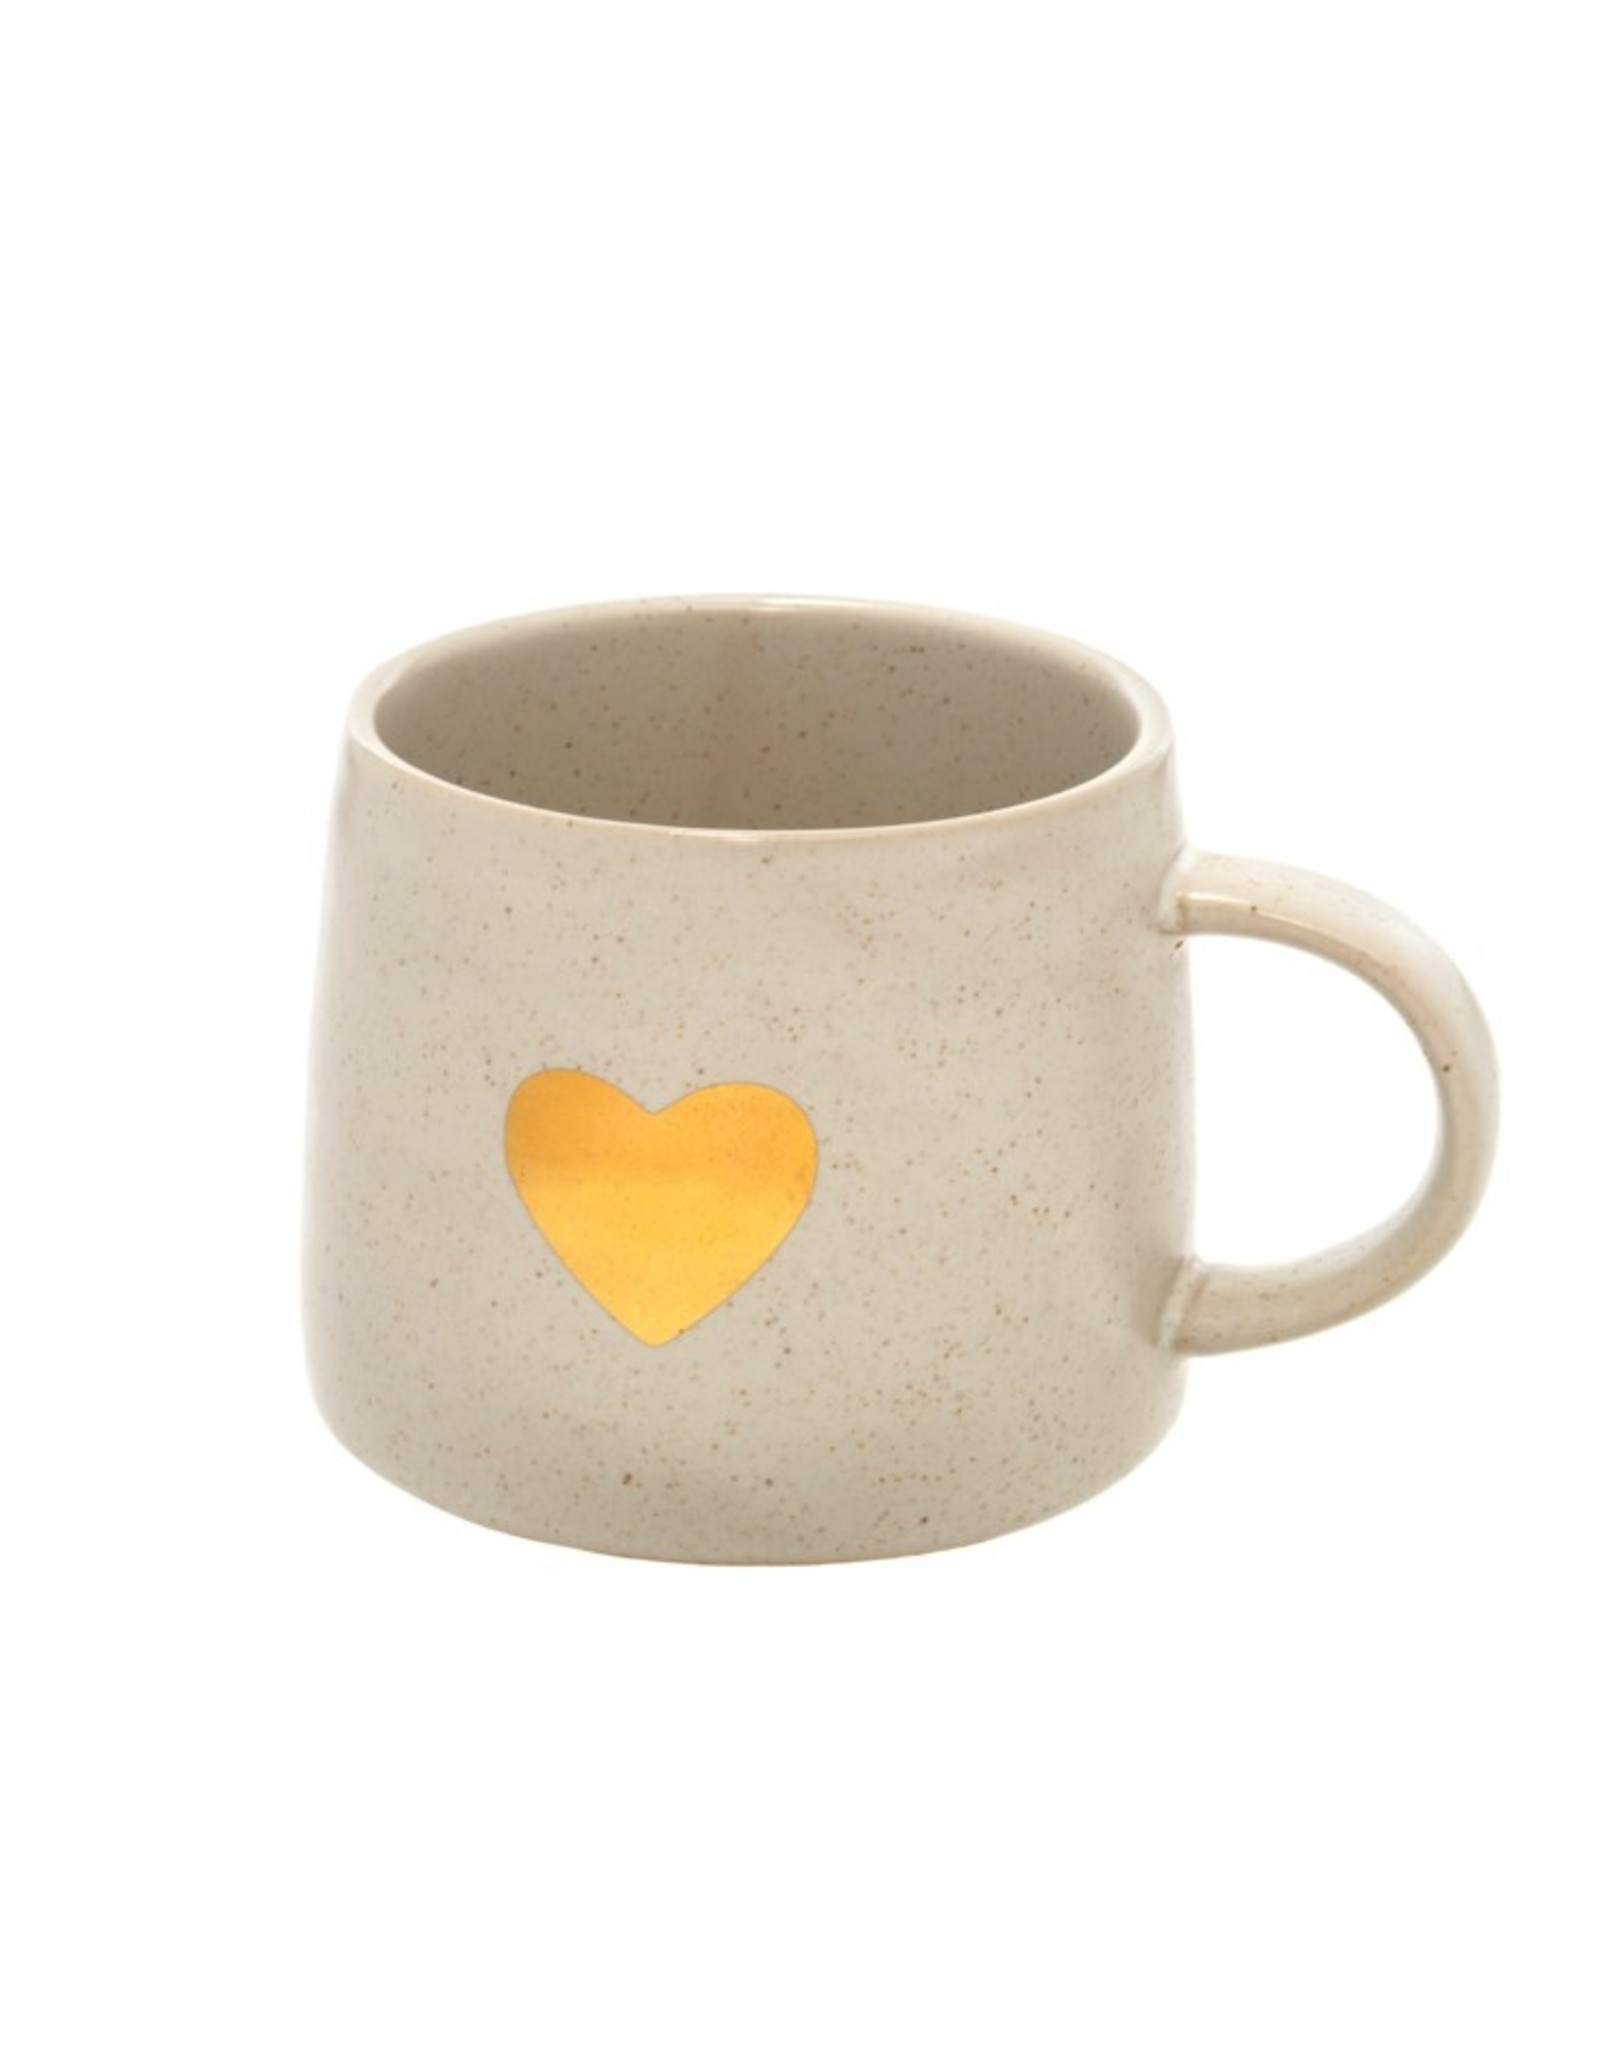 Gold Heart Mug white